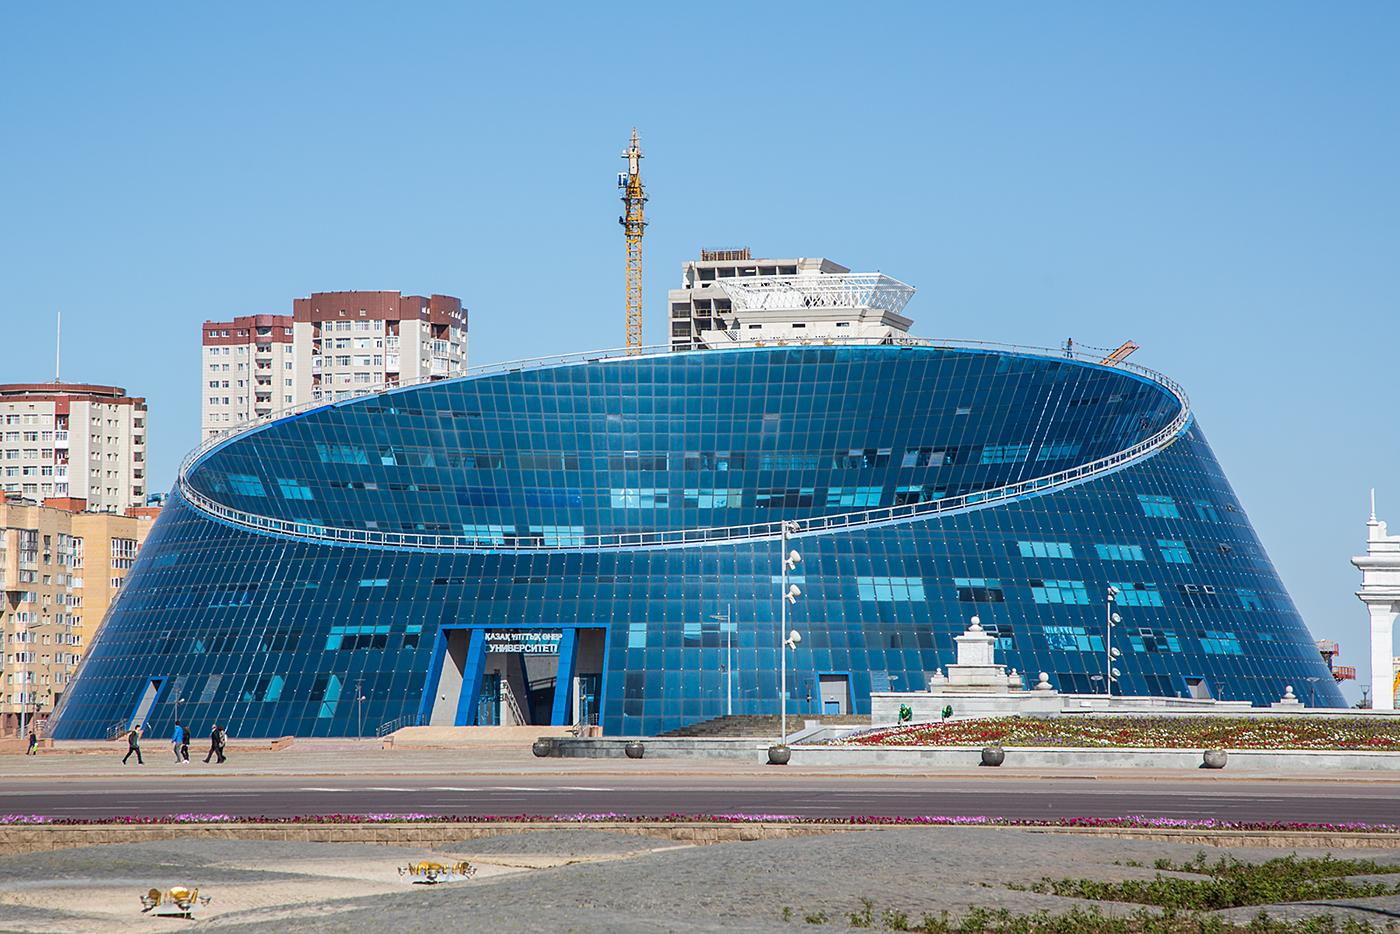 Kazakh National University of the Arts